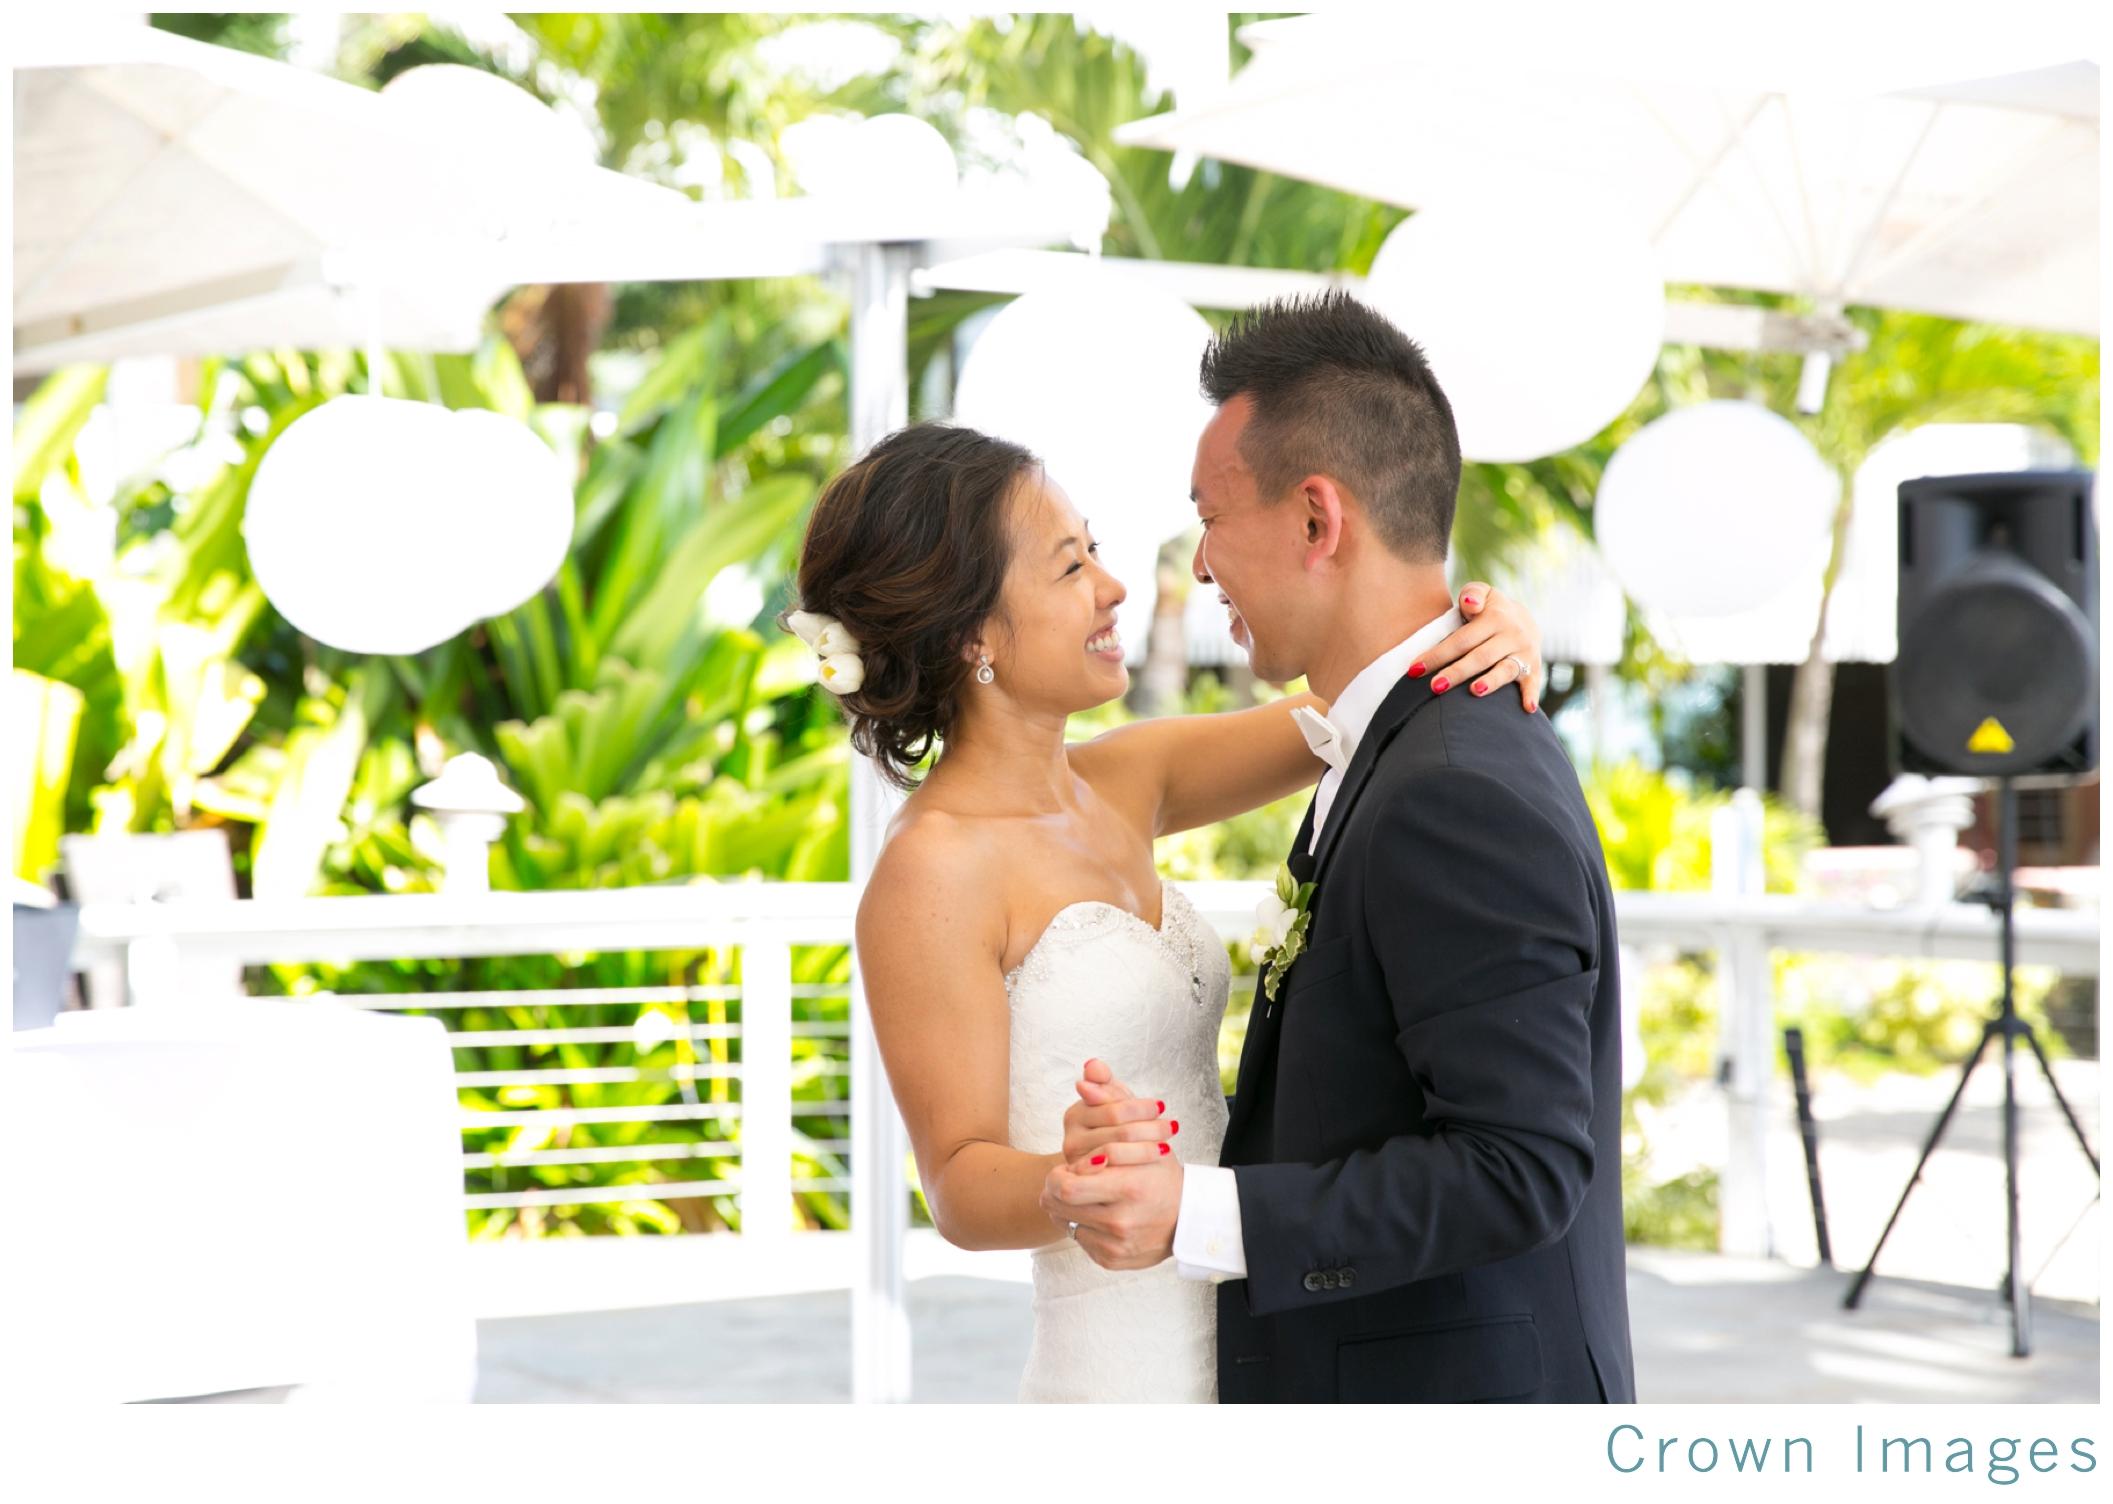 st_thomas_wedding_photographer_0810.jpg